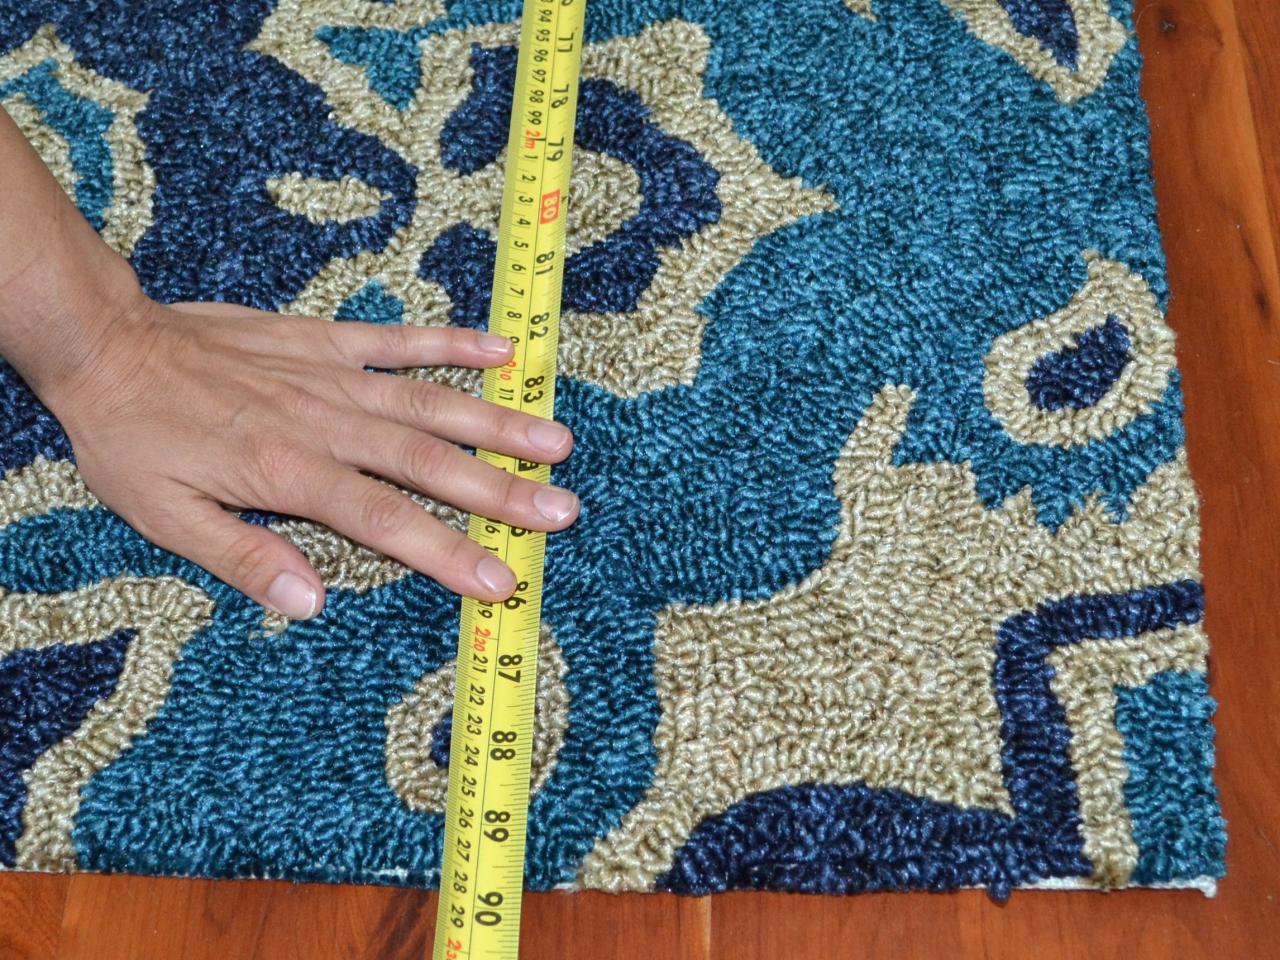 how to make a rug into a headboard how tos diy. Black Bedroom Furniture Sets. Home Design Ideas